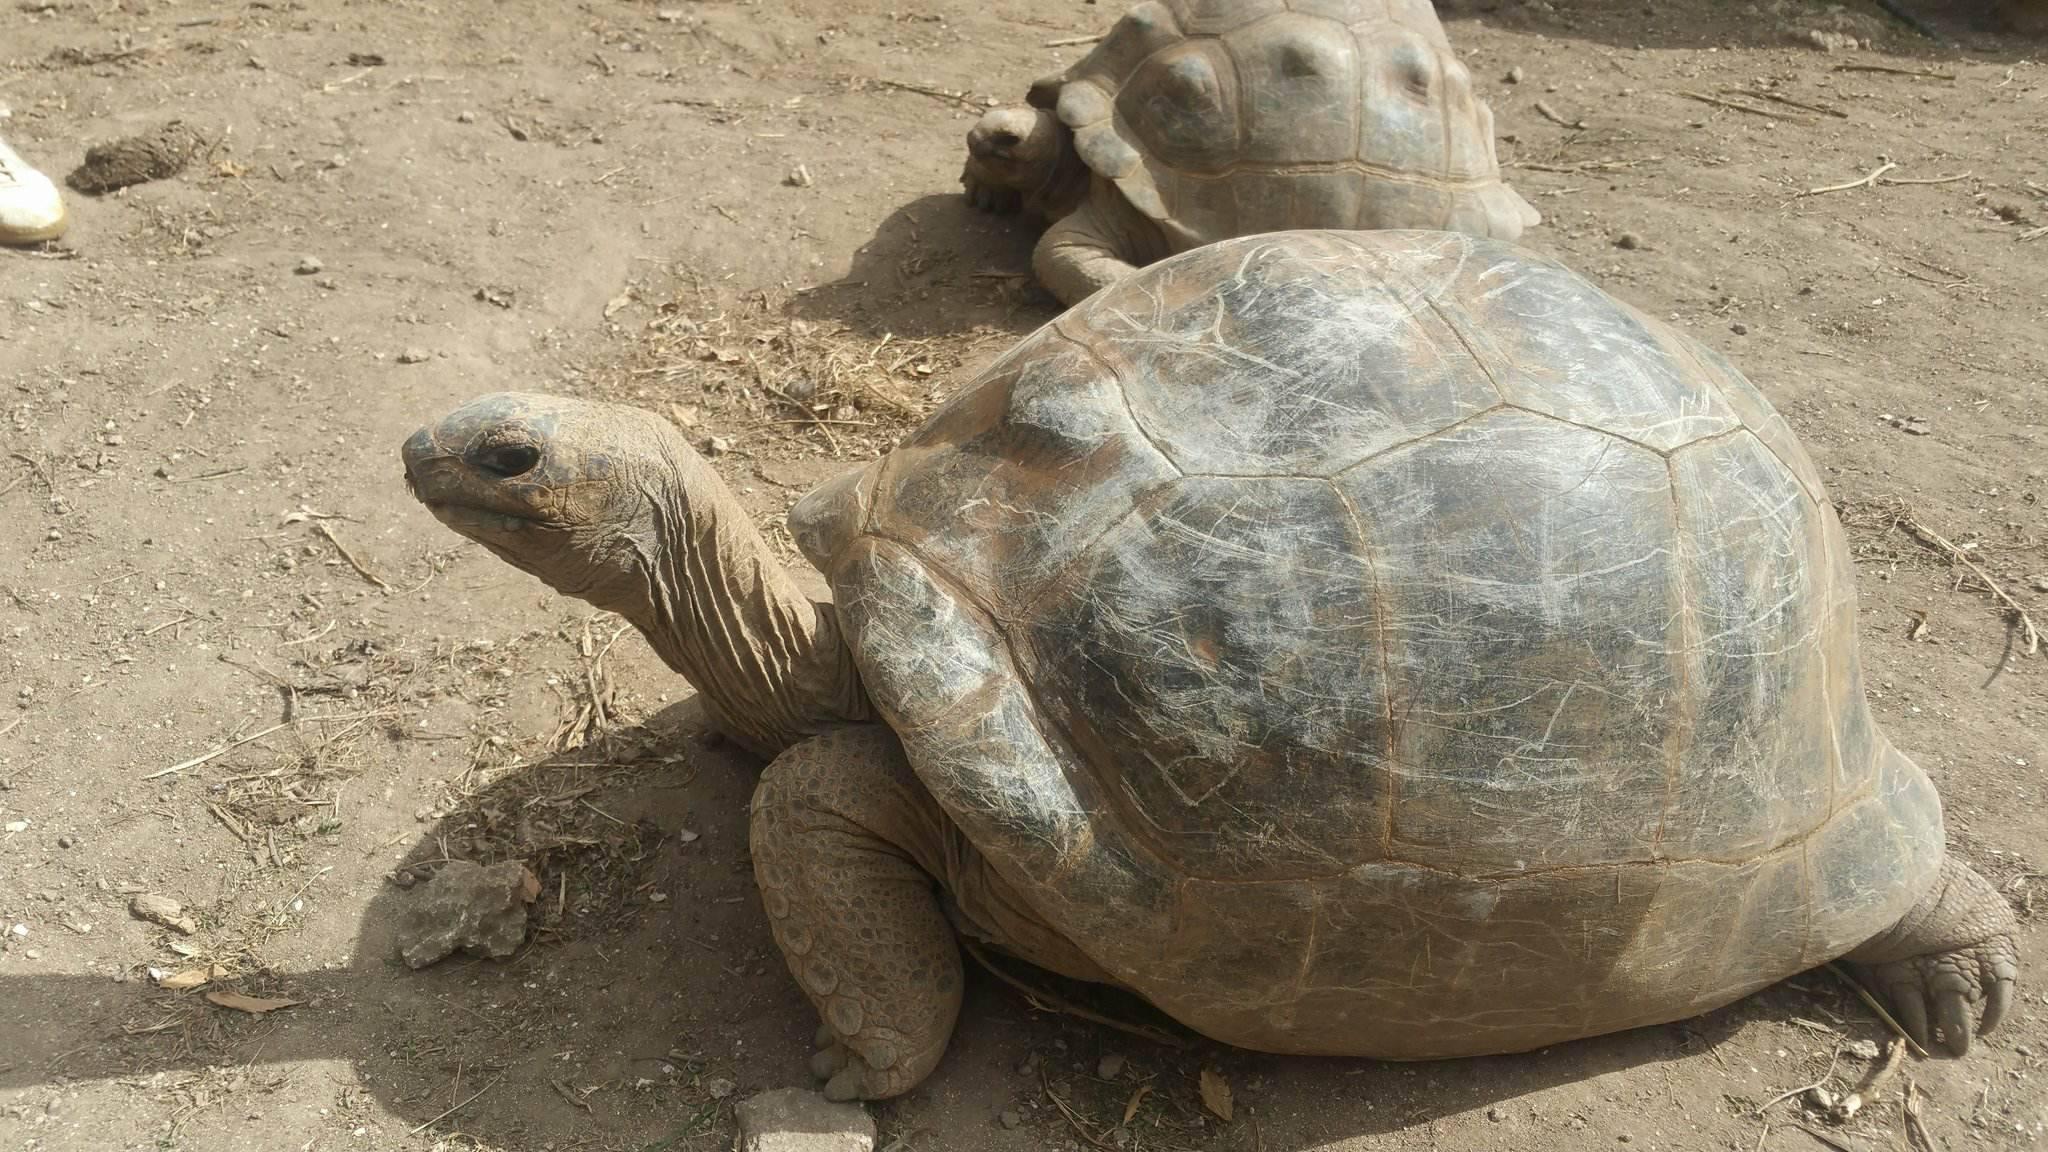 Giant Tortoise of Mauritius